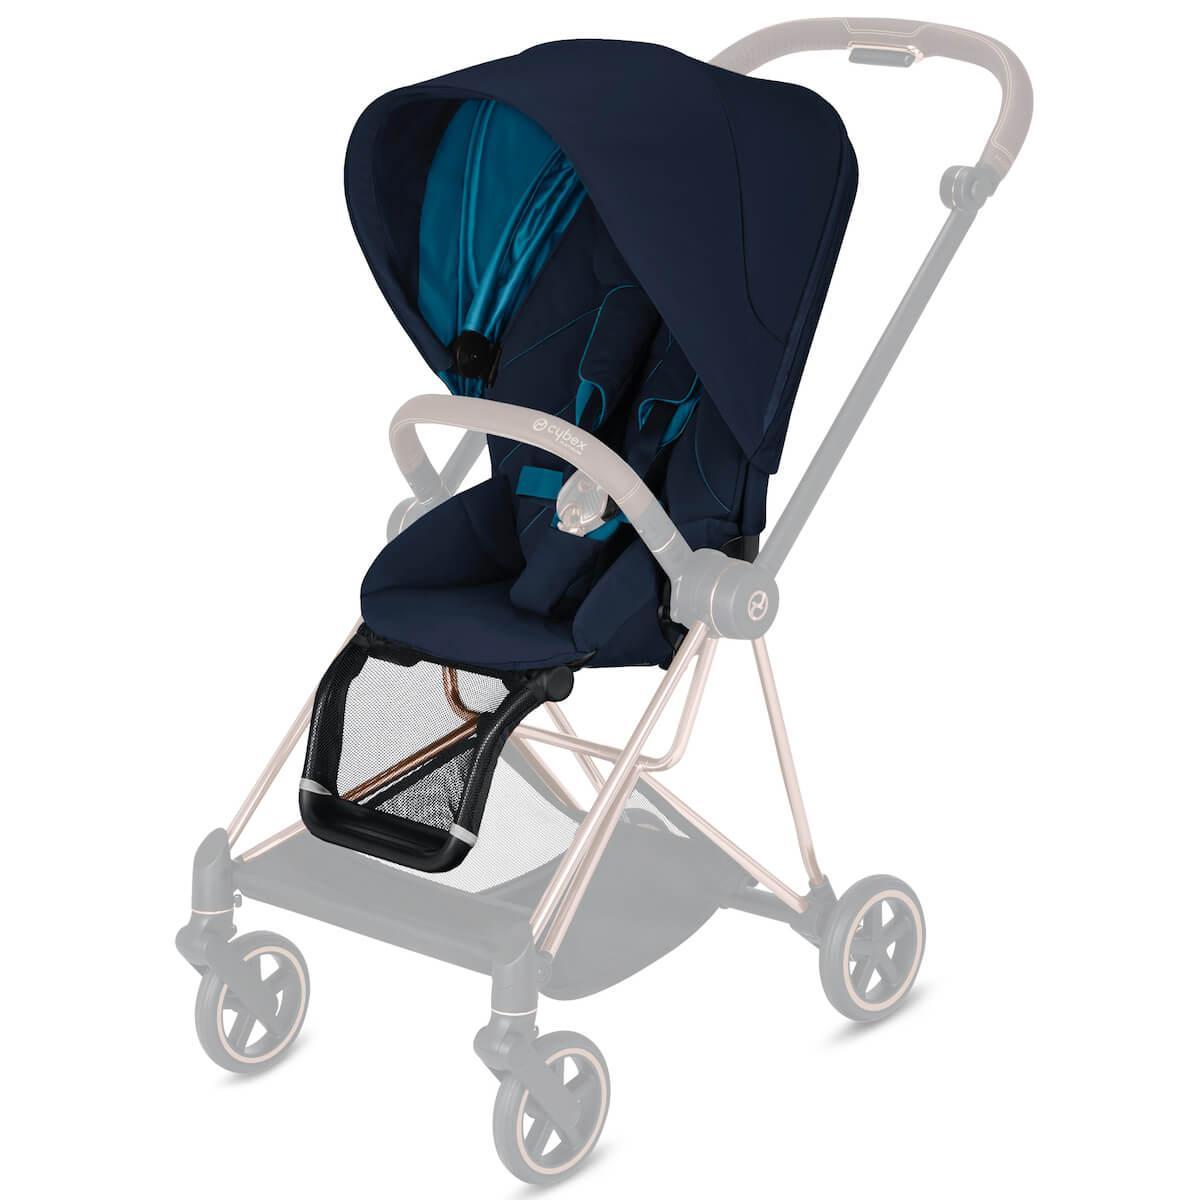 Asiento-pack silla MIOS Cybex Nautical blue